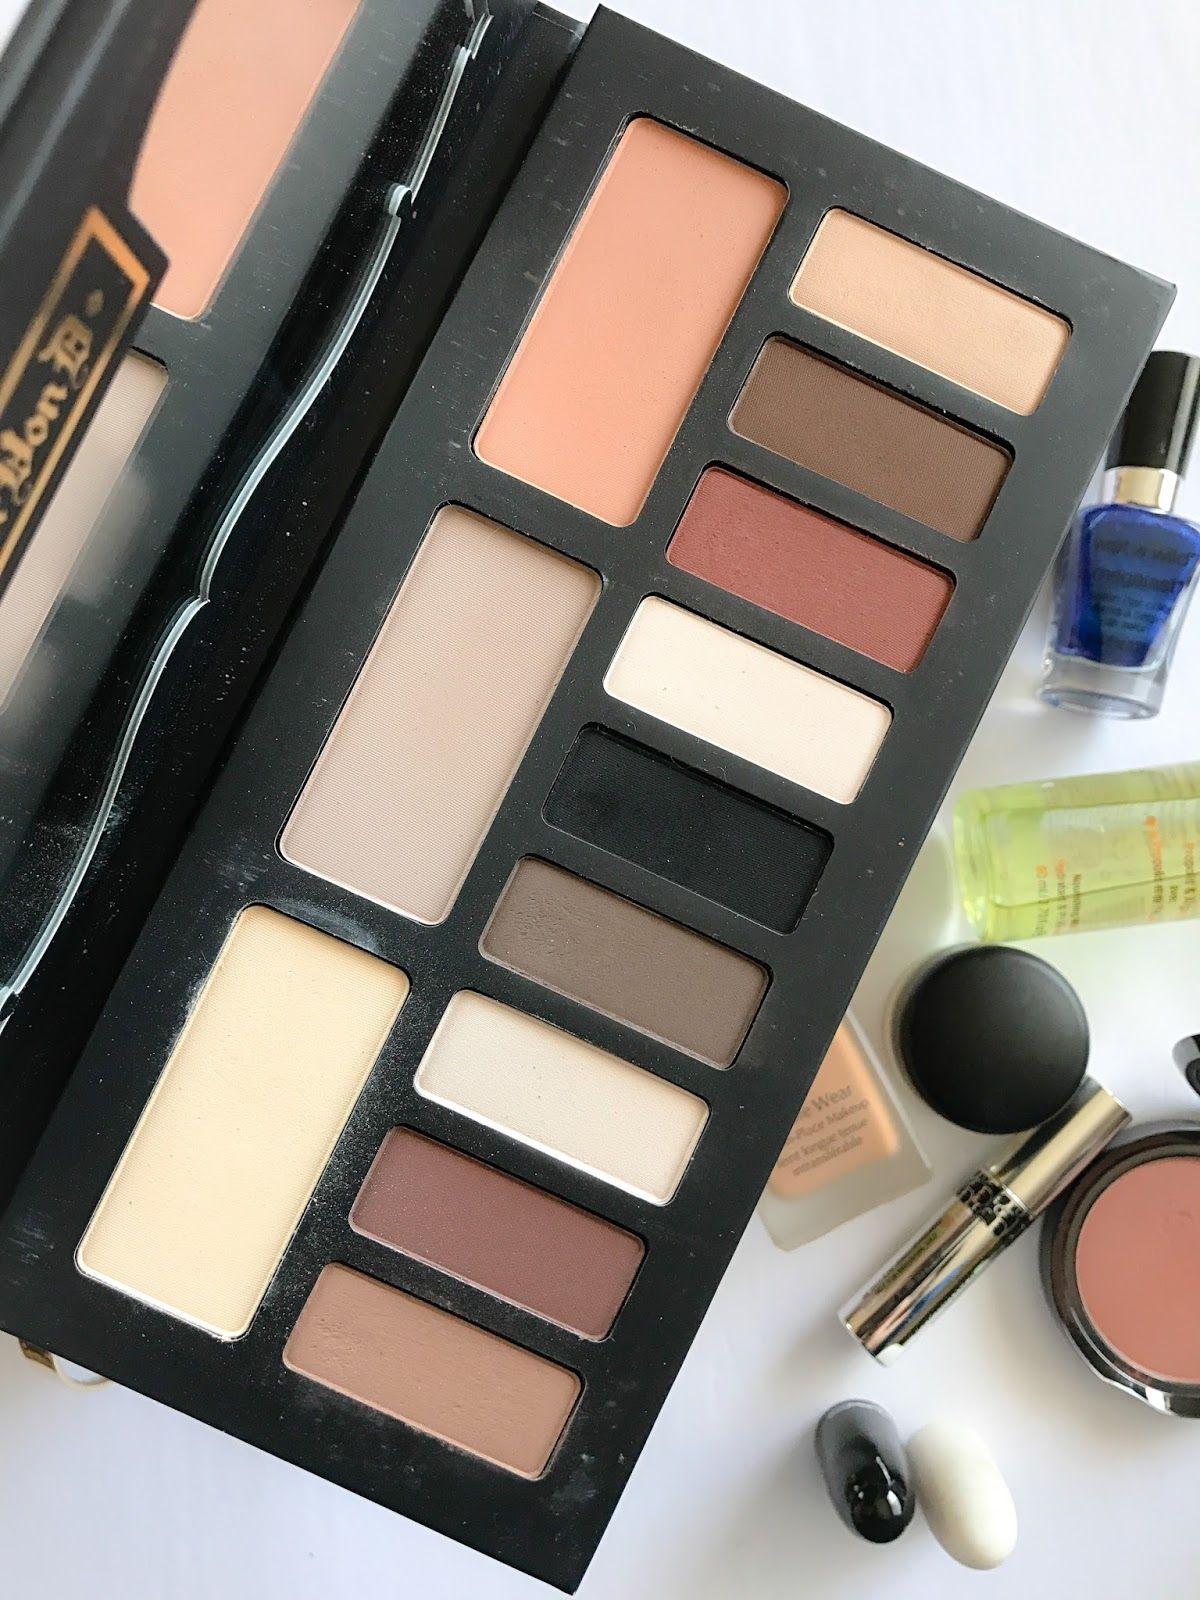 My December Beauty Favorites Kat Von D Shade Light Eye Palette Monthlyfavorites Decemberb Best Eyeshadow Palette Shade And Light Palette Beauty Favorites